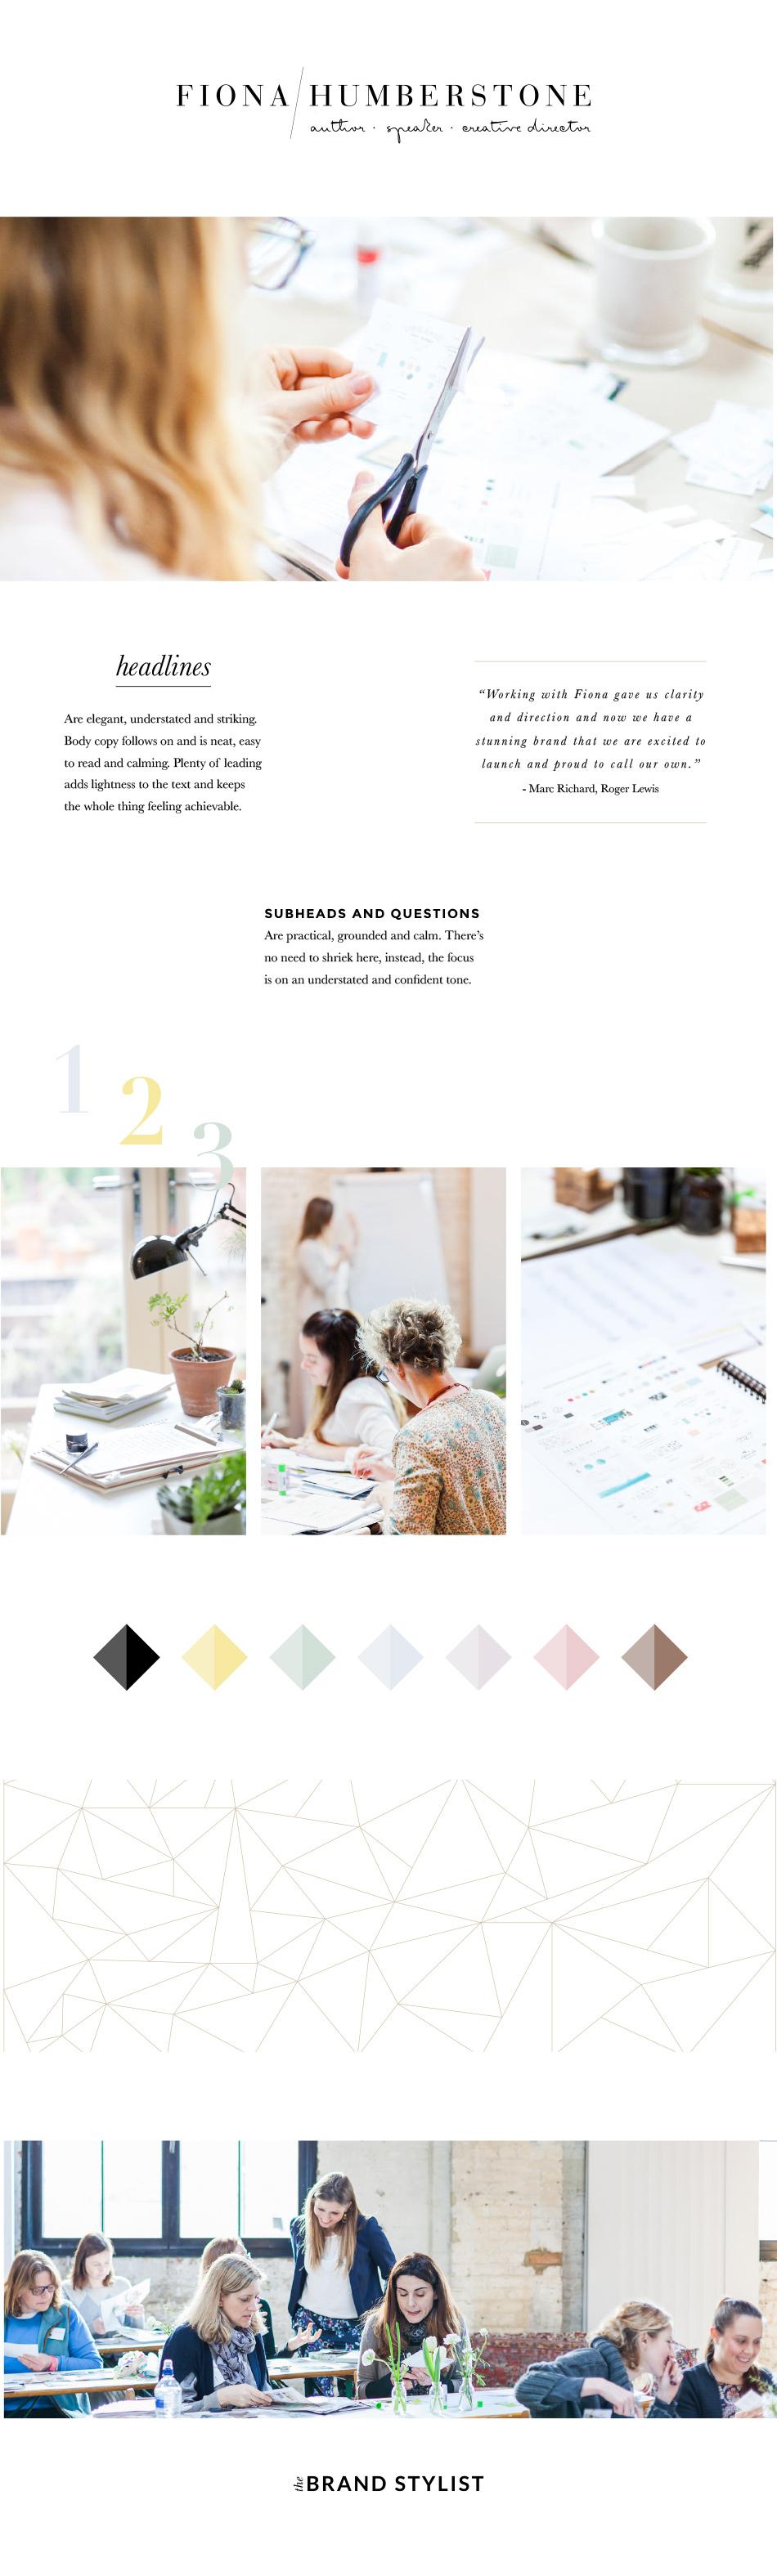 Fiona-Humberstone-New-Identity-Brand-Elements